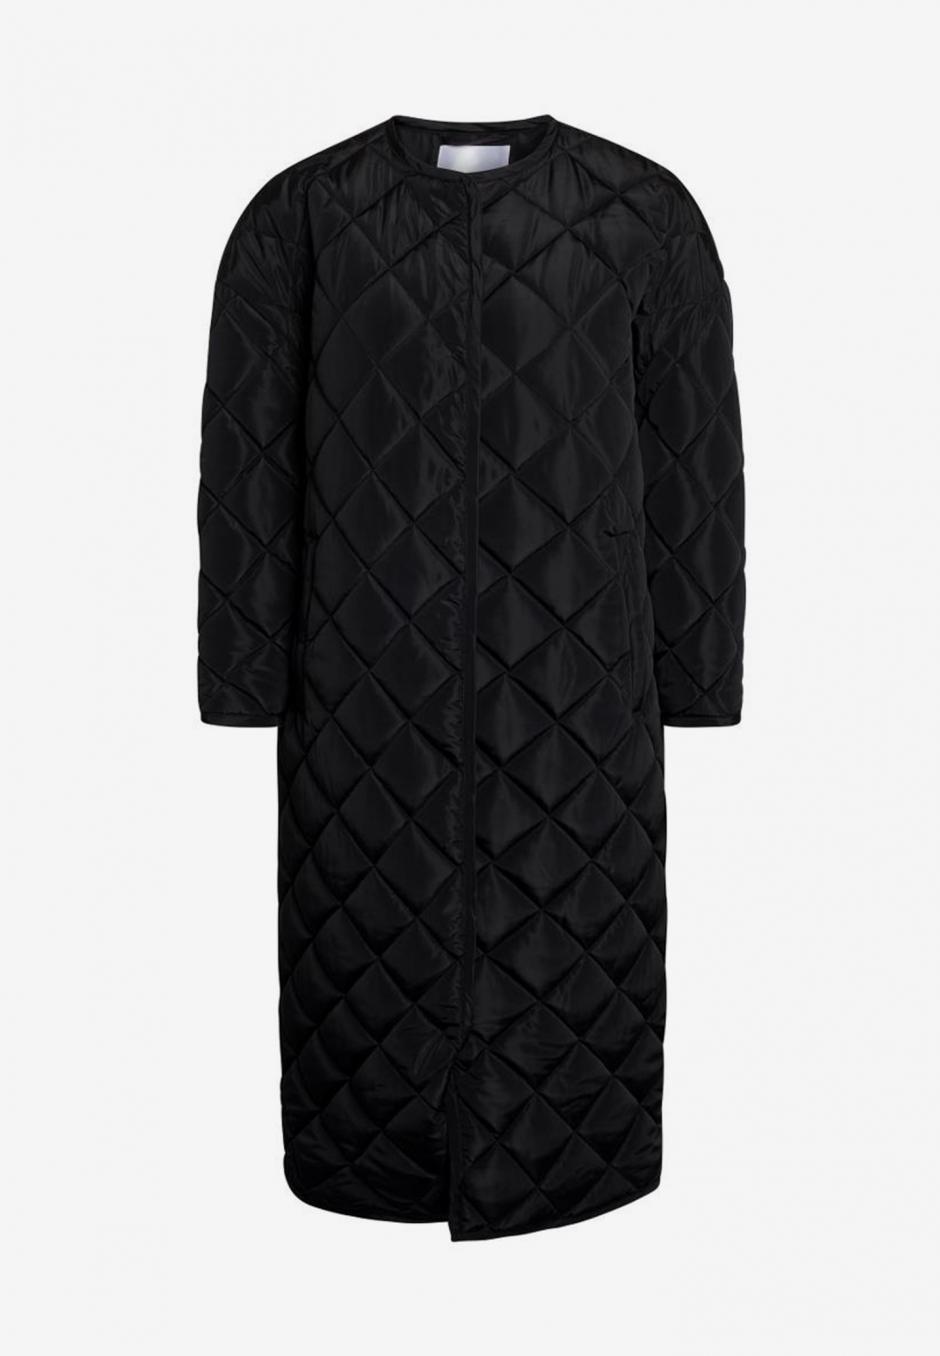 Co'couture Mandalina Quilt Coat